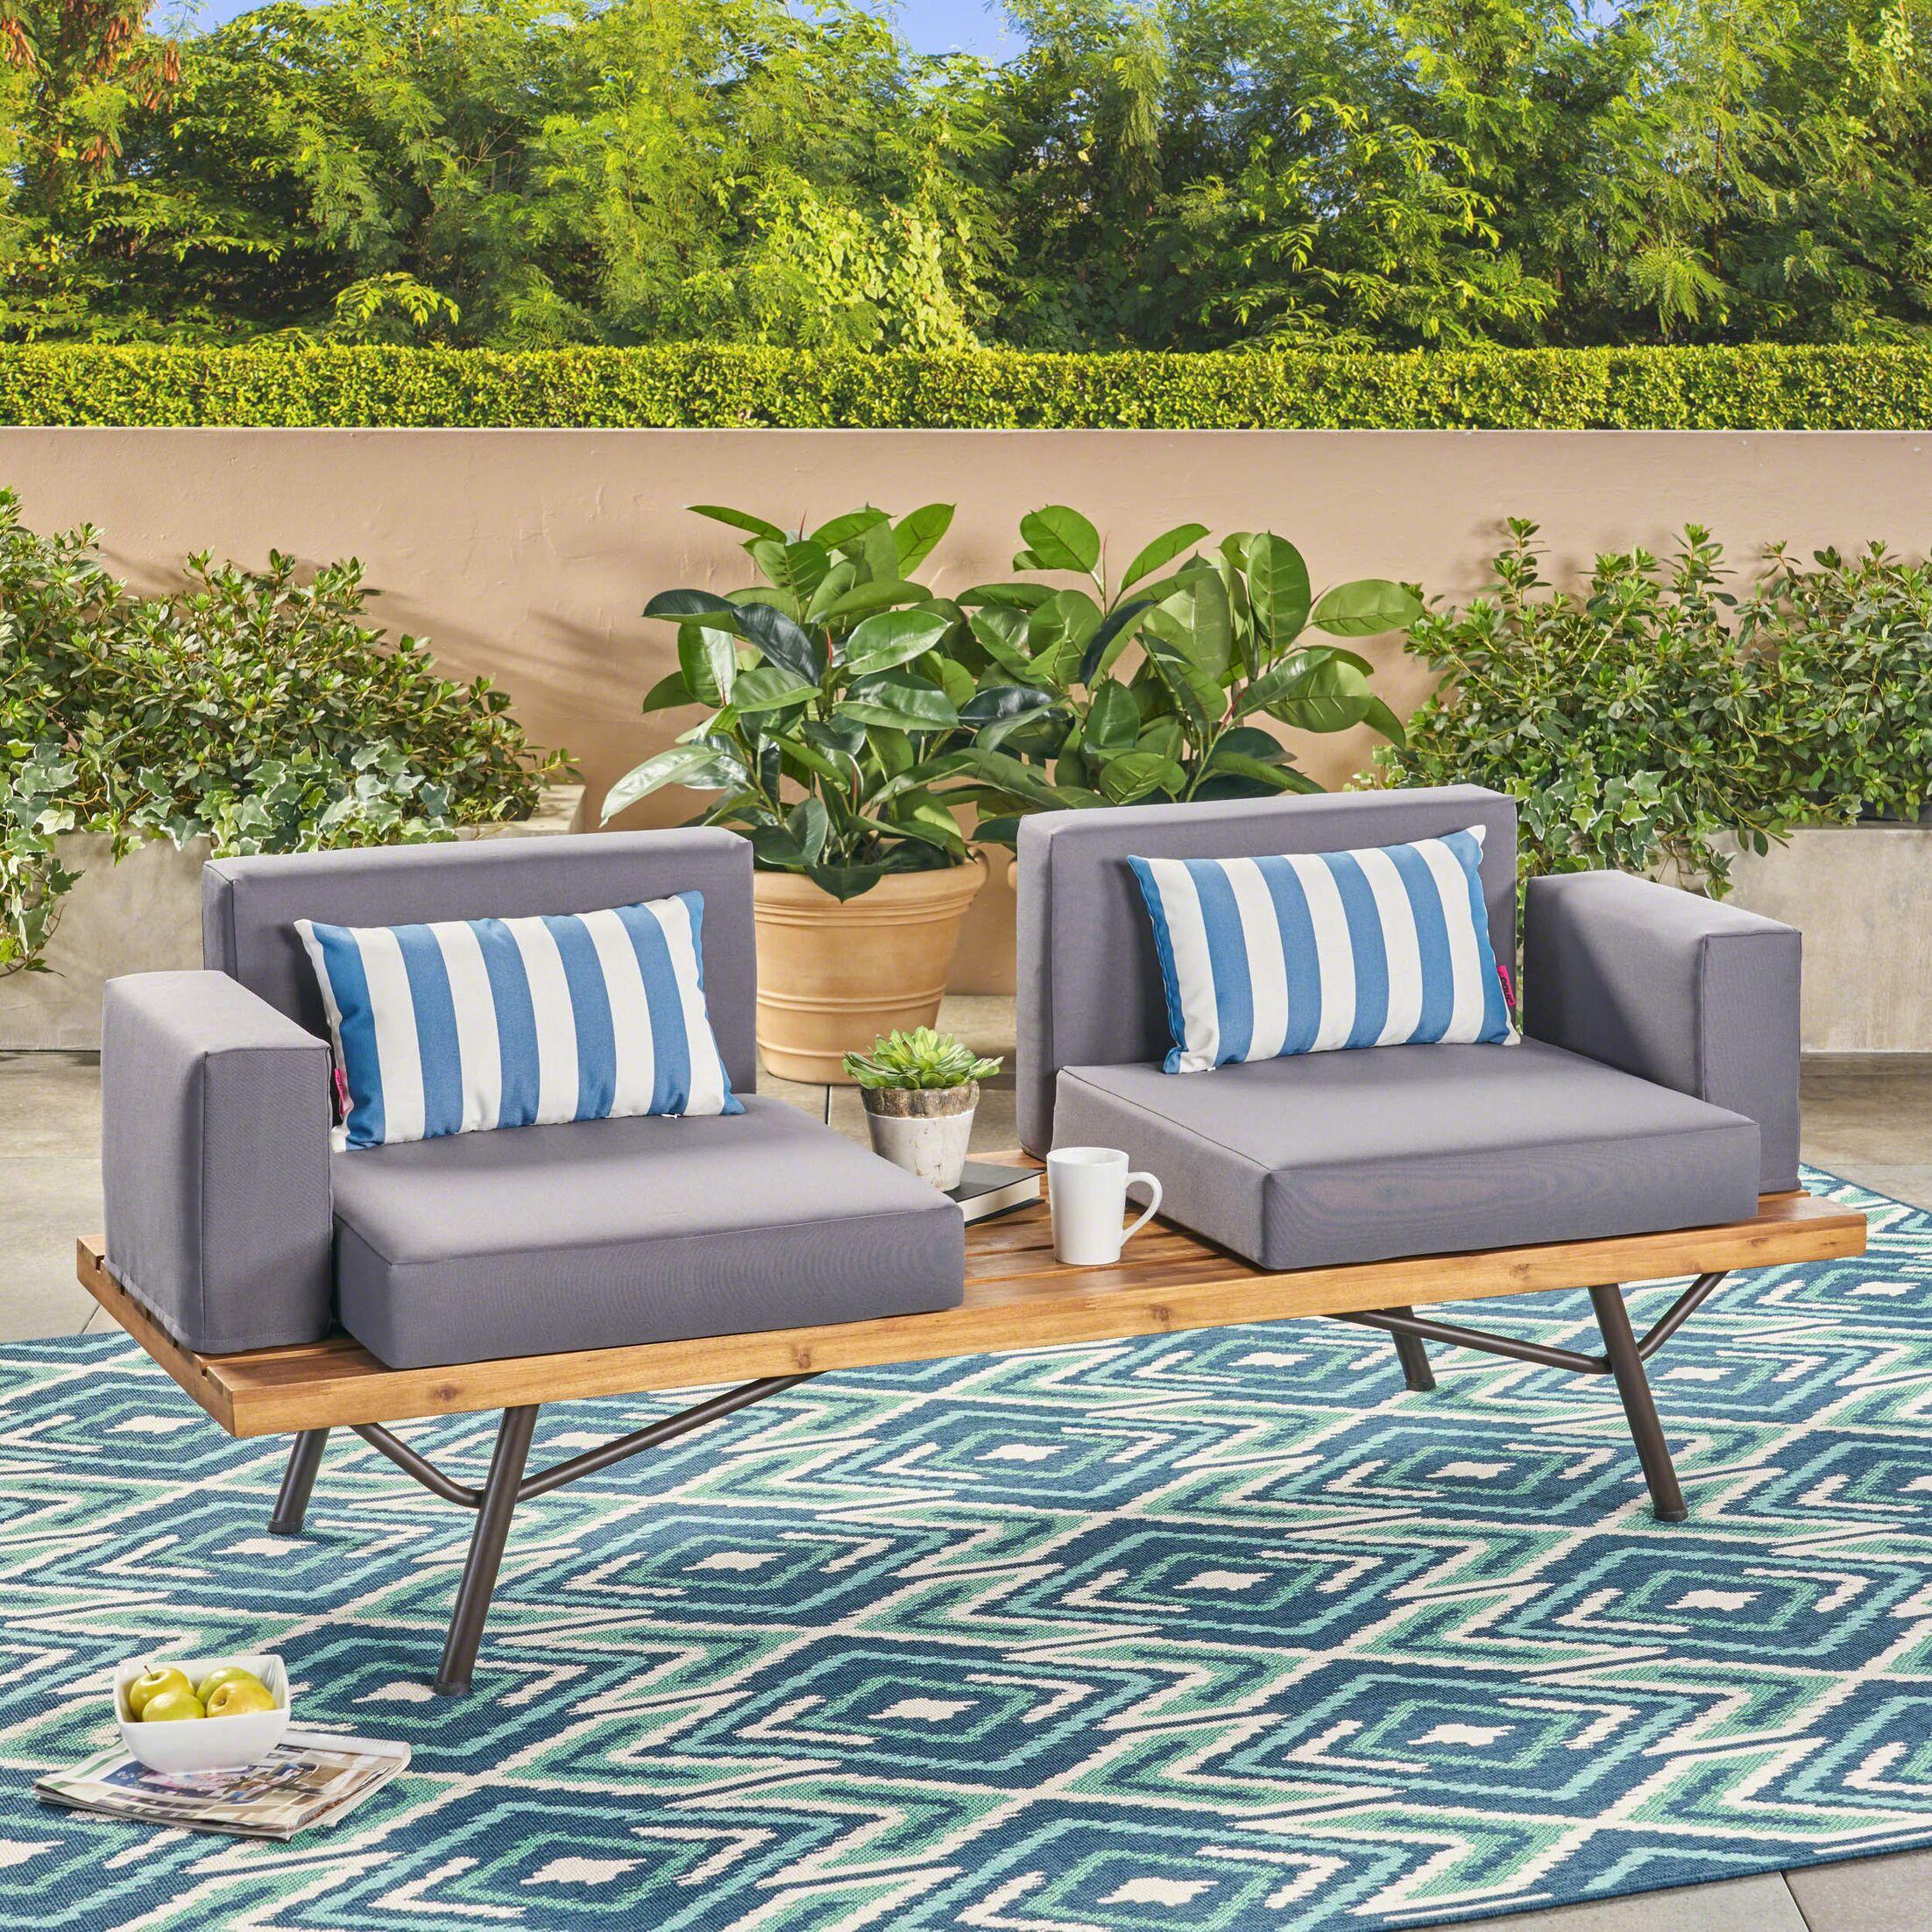 Ambrosina Teak Patio Sofa with Cushions